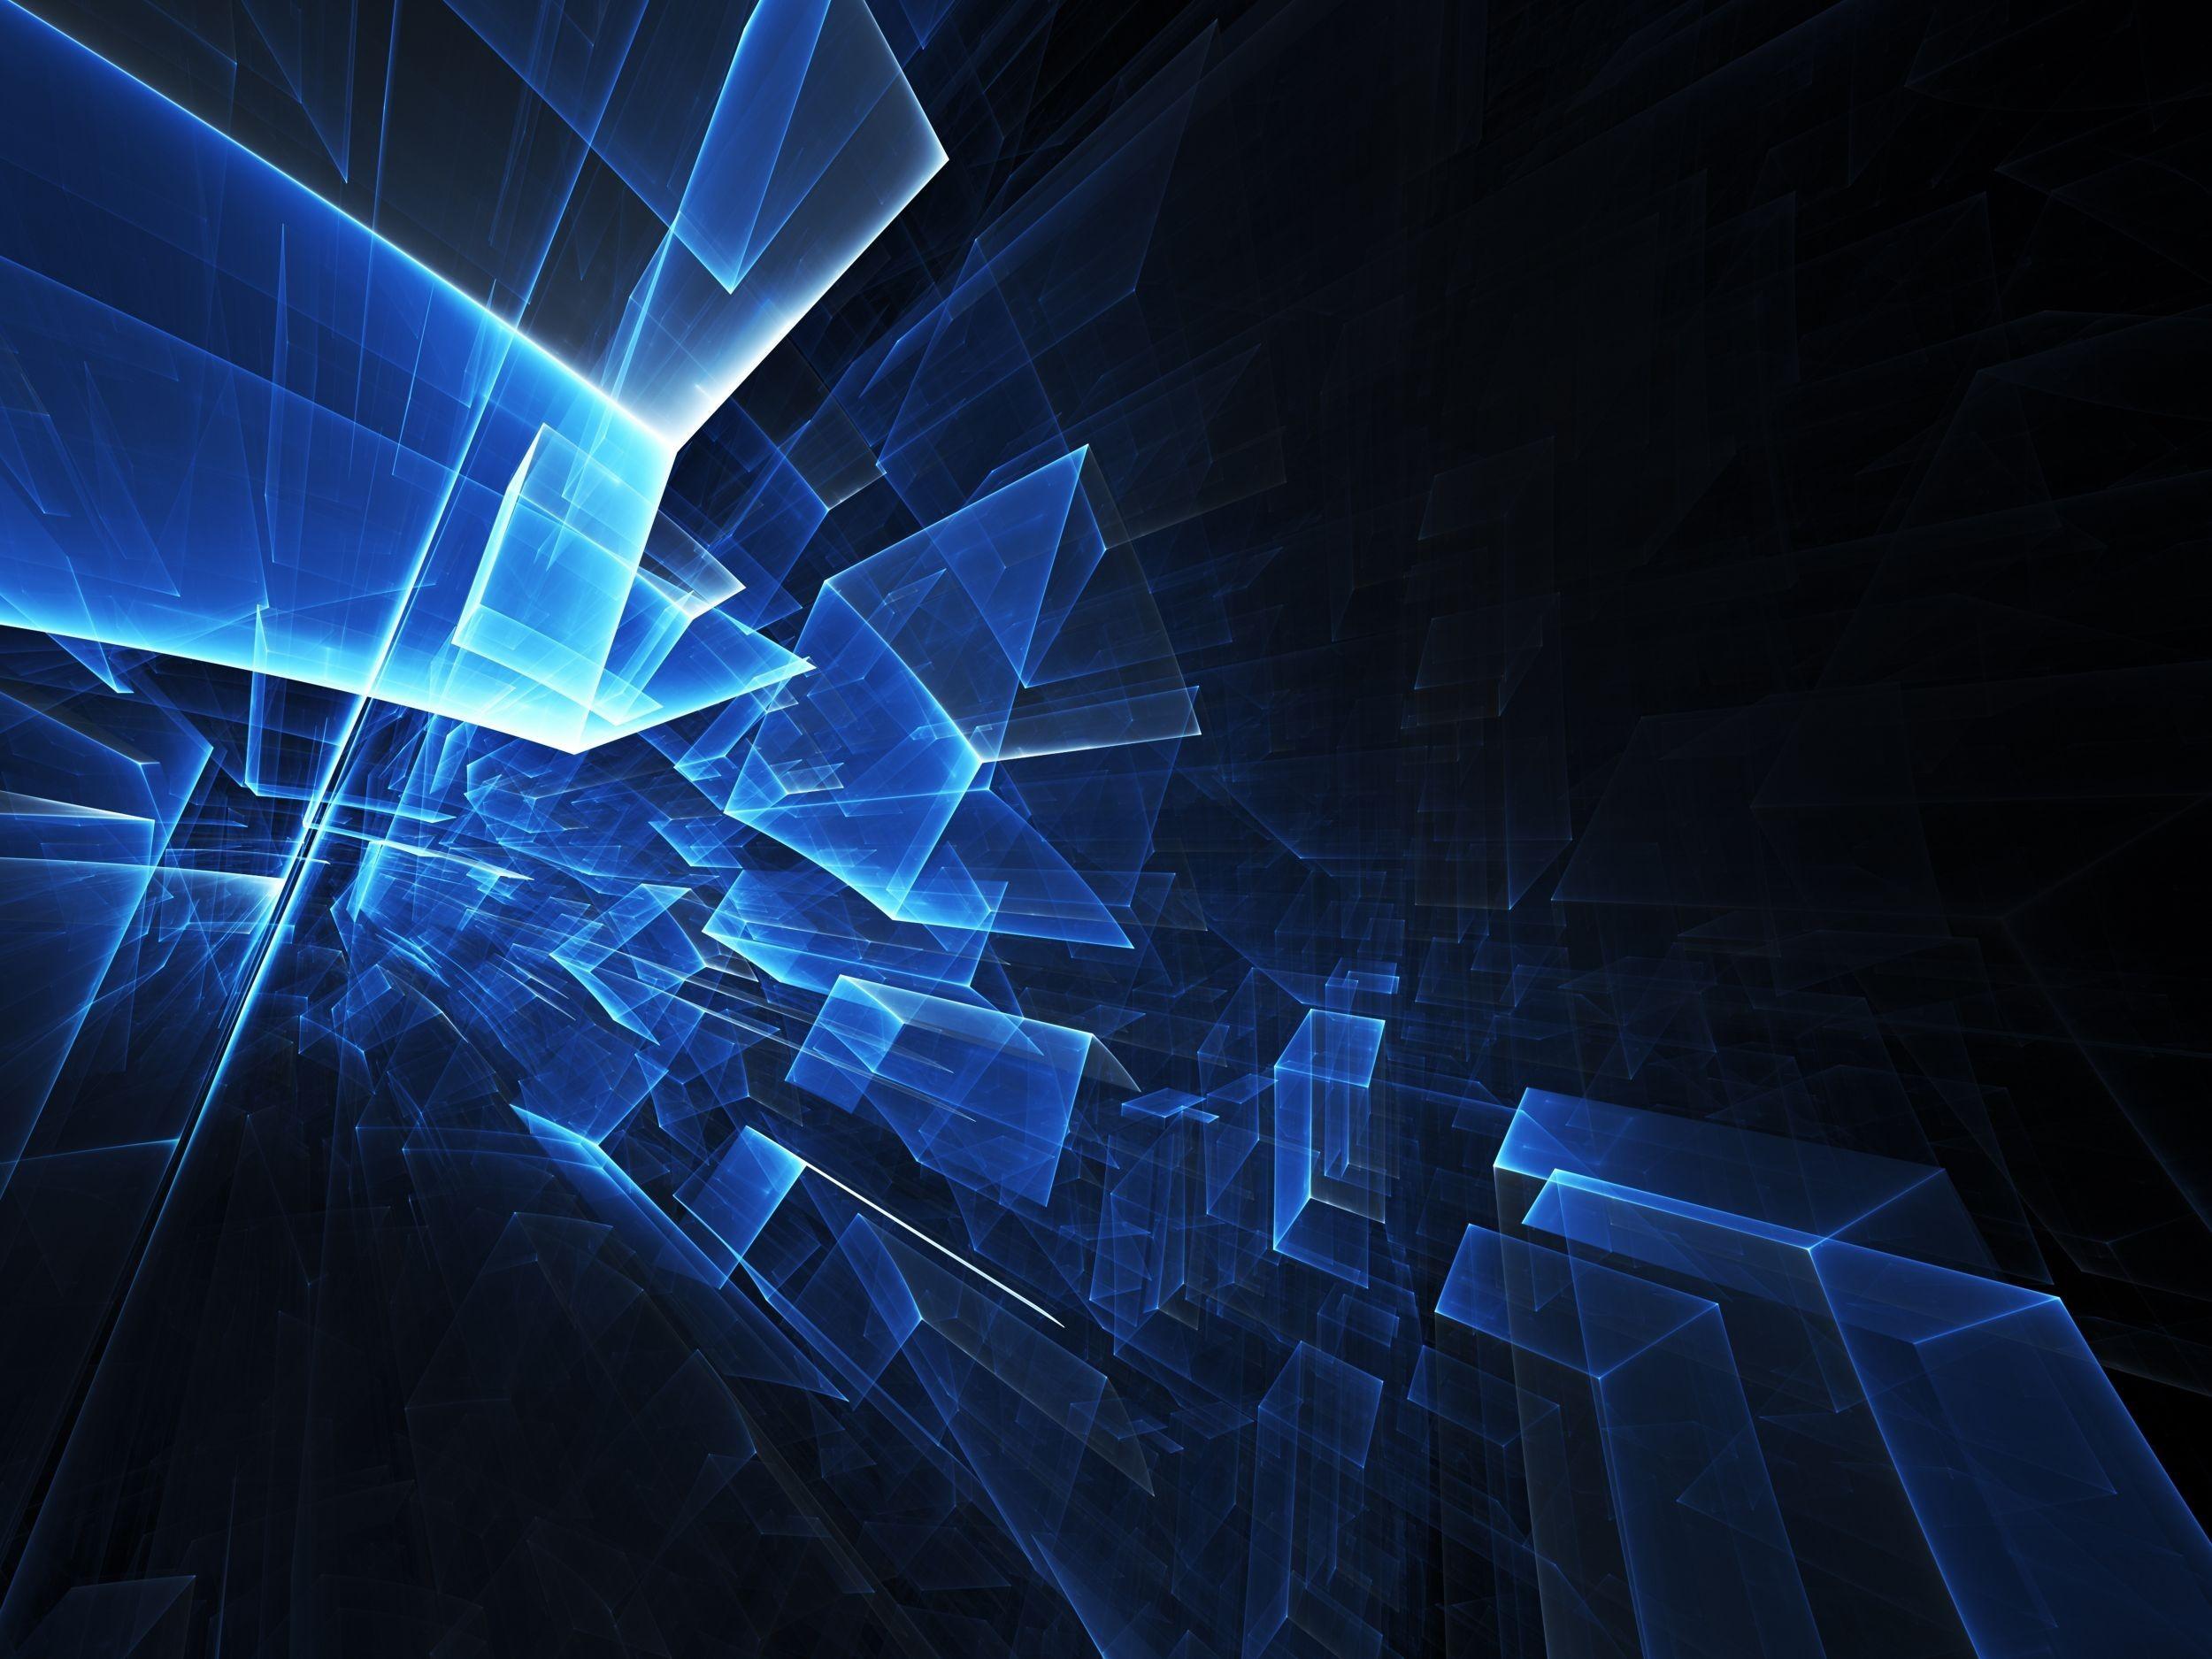 General 2500x1875 abstract texture blue digital art